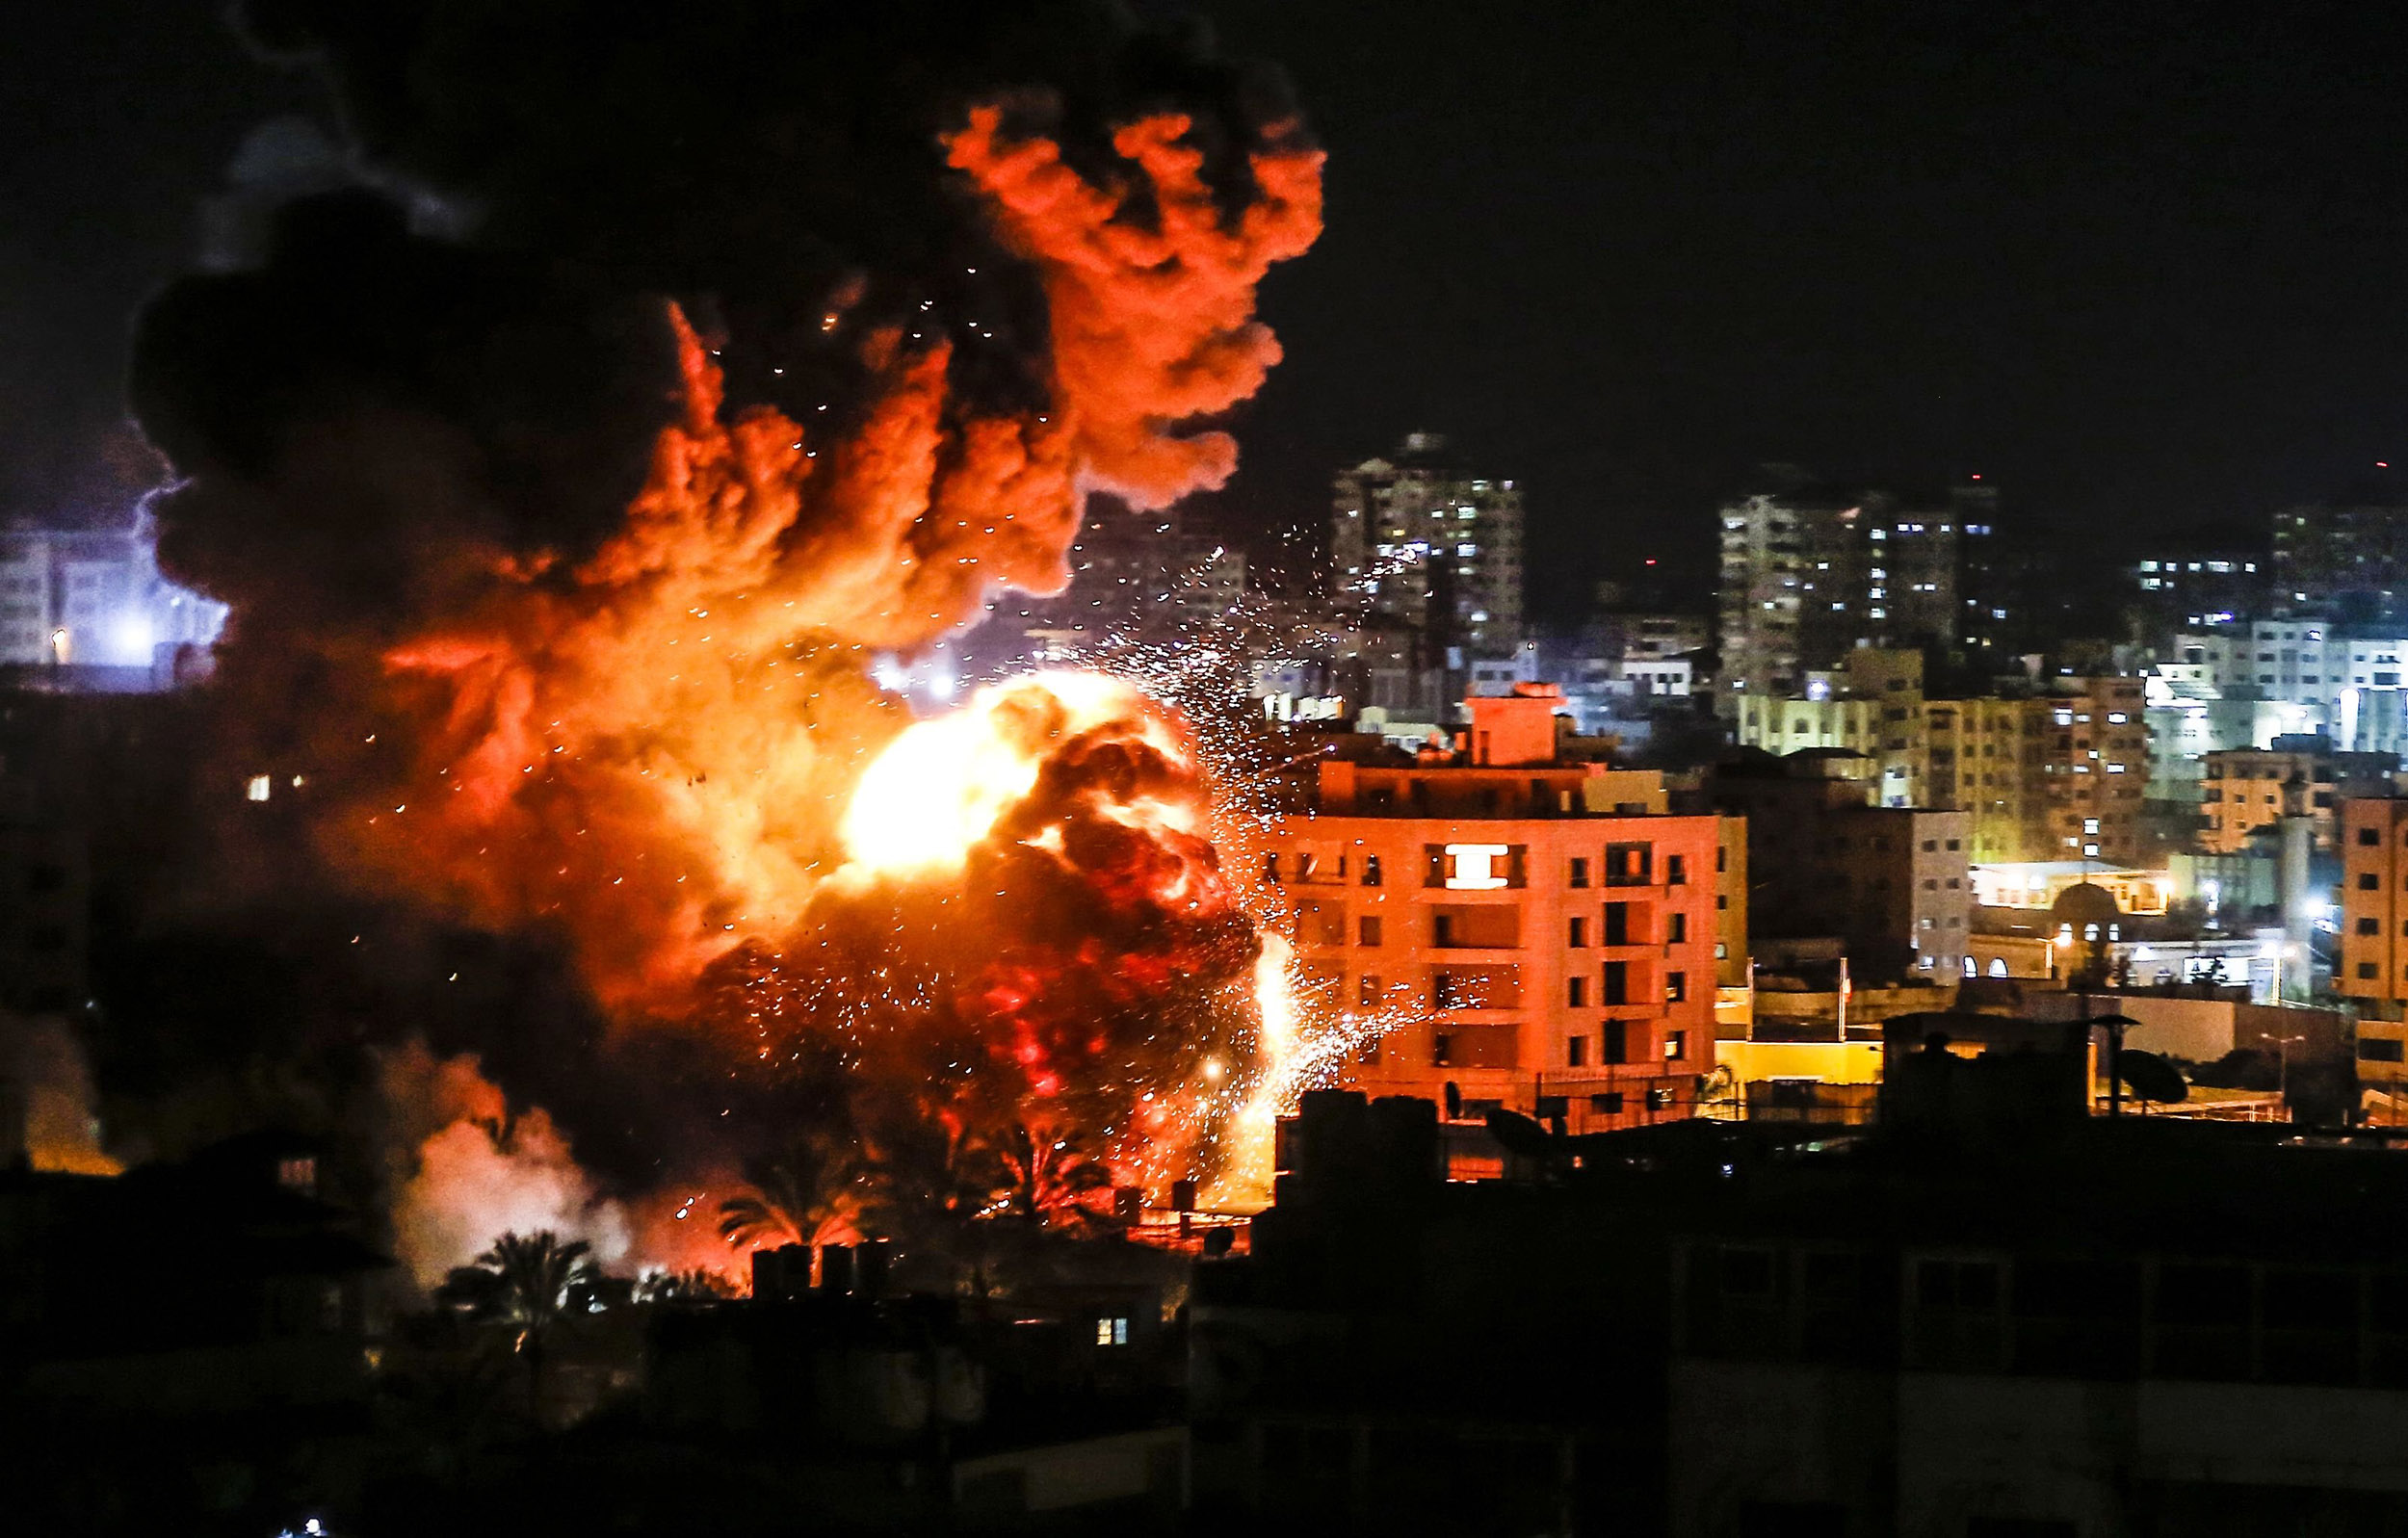 Gaza tense after Israel, Hamas exchange heavy fire overnight